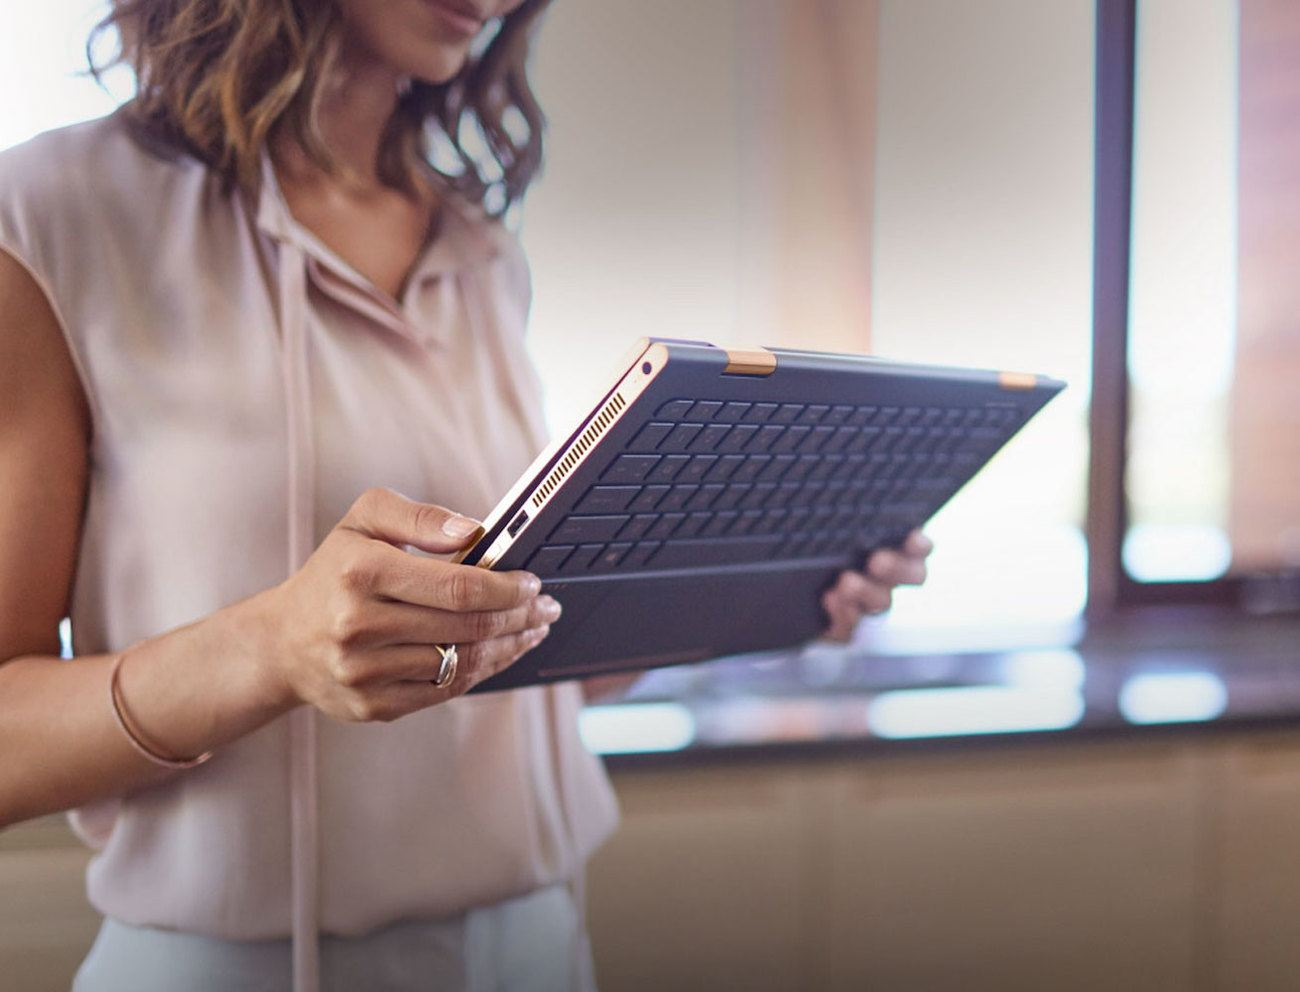 HP 15-inch Spectre x360 Convertible Laptop